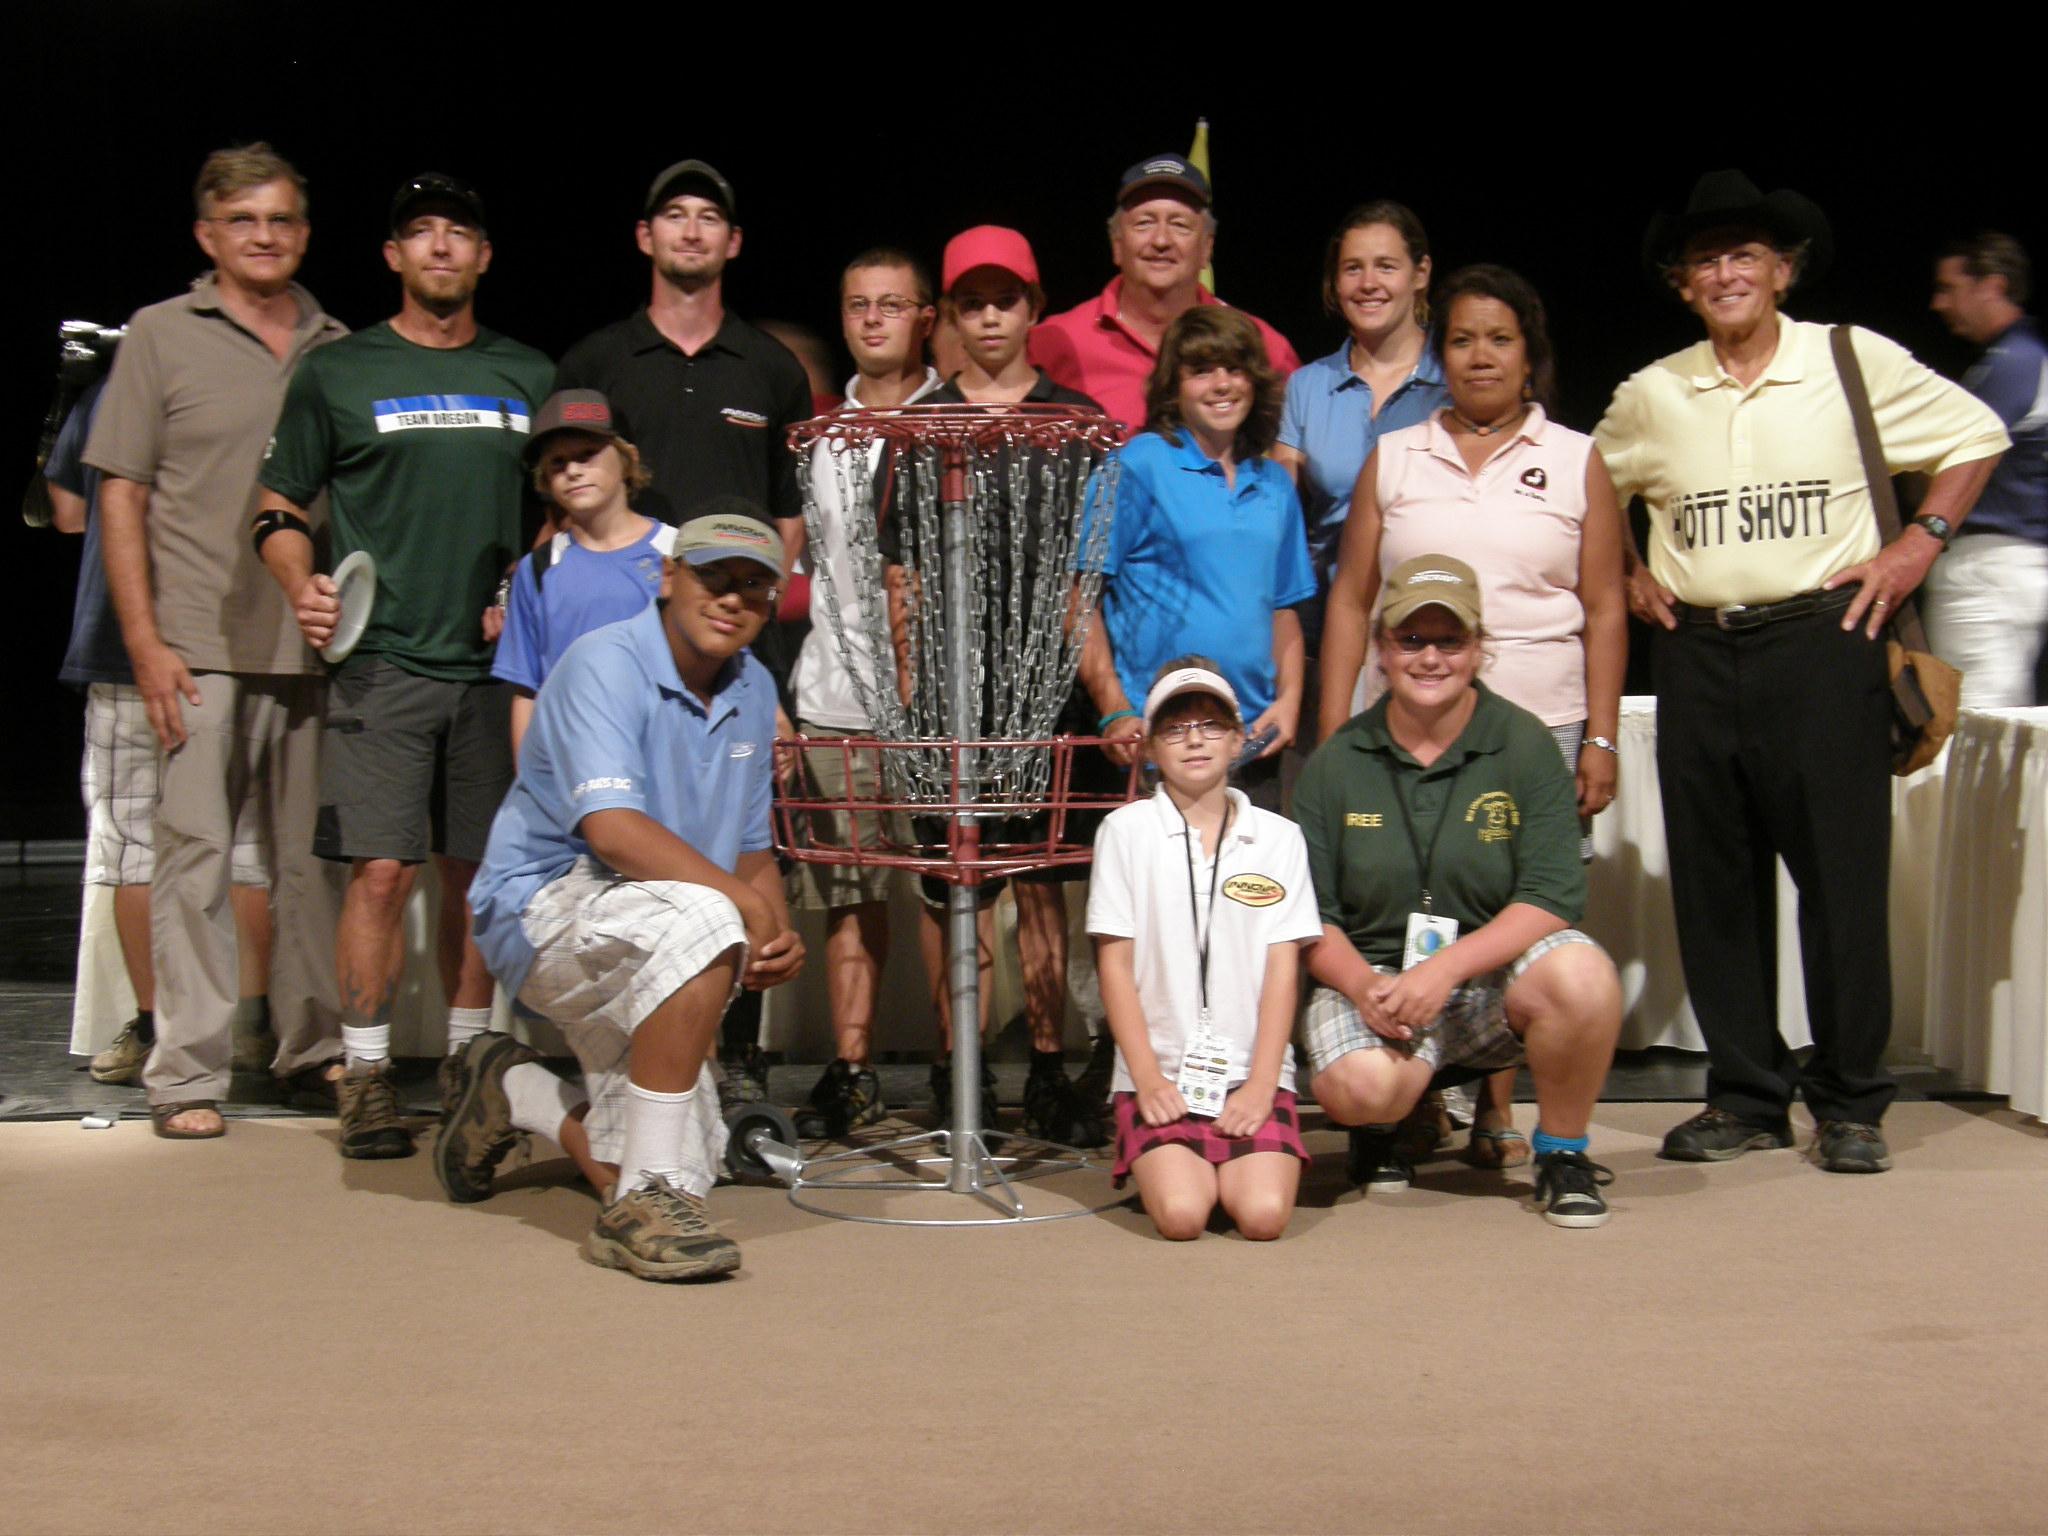 2011 Worlds 1st Place Winners.JPG